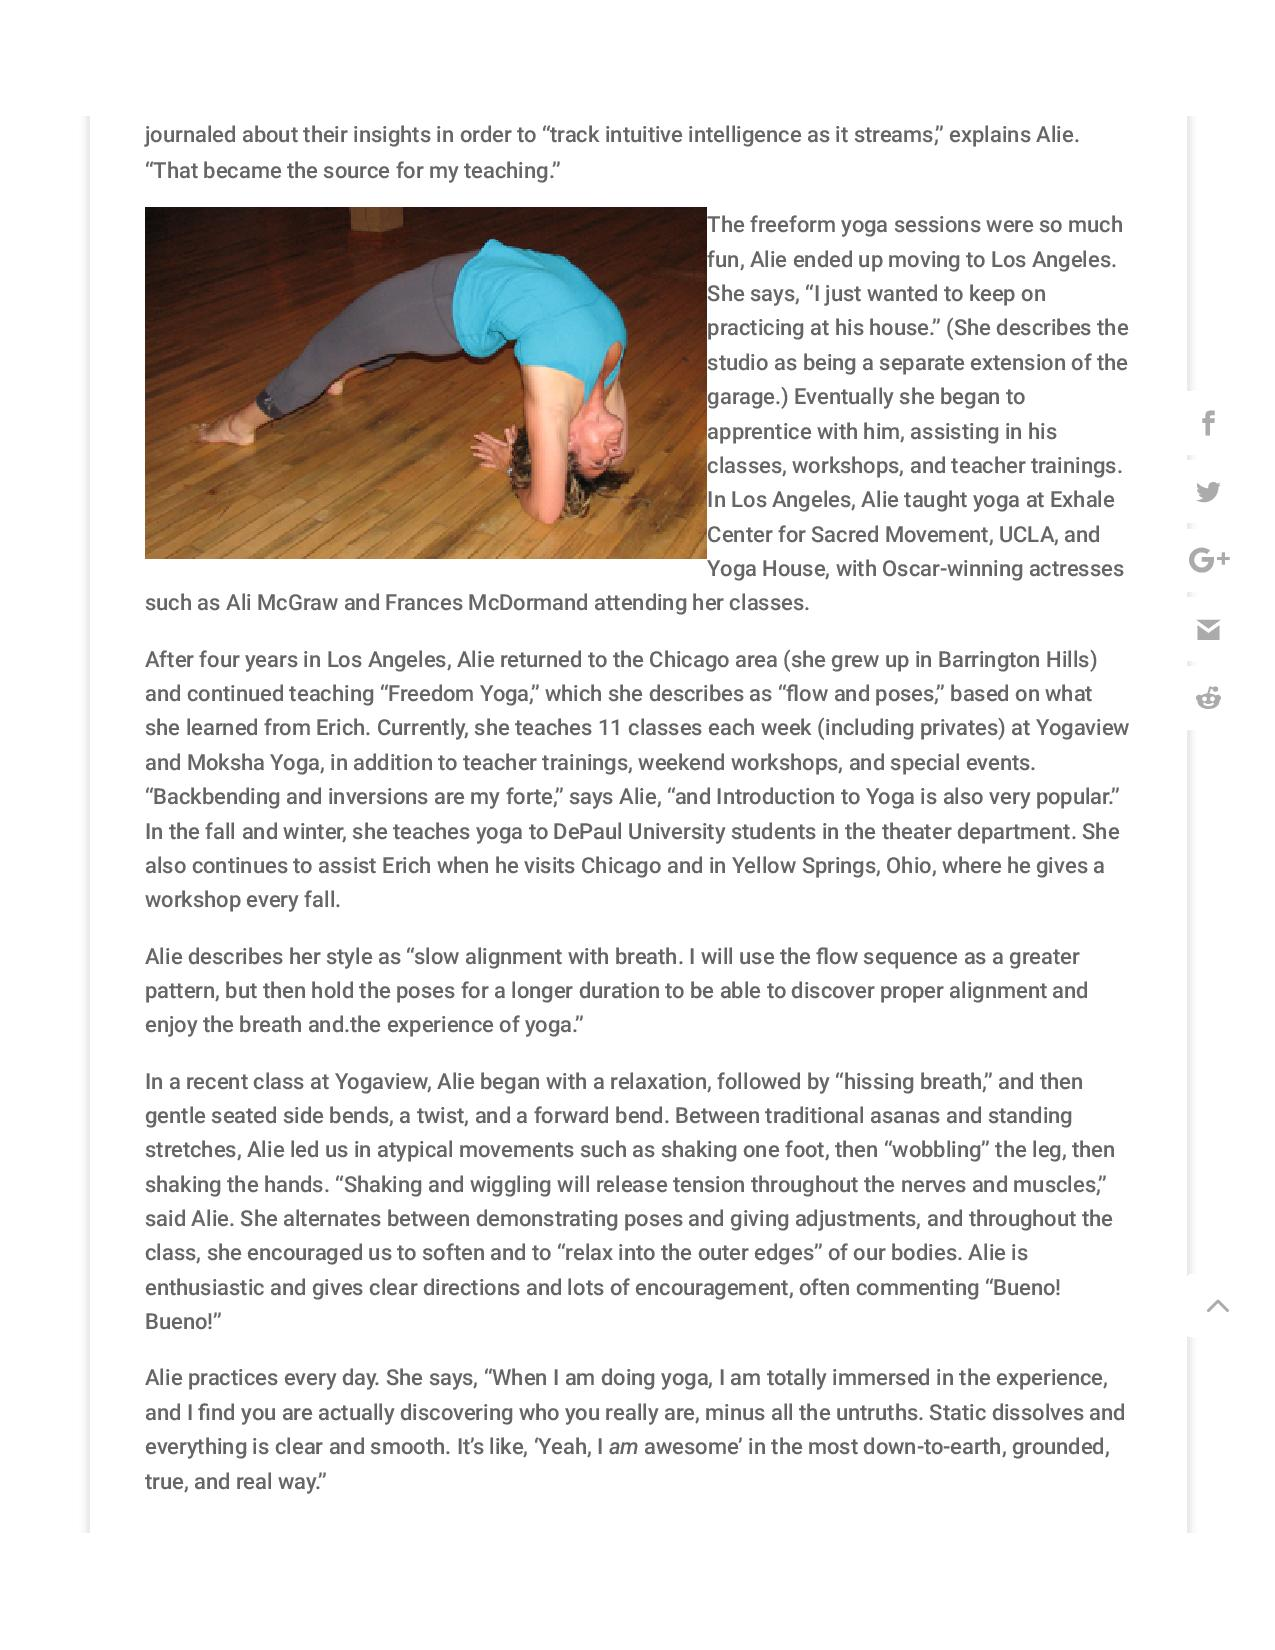 Alie McManus_ Teaching Freedom Yoga as Learned from Erich Schiffmann _ Yoga Chicago-page-002.jpg